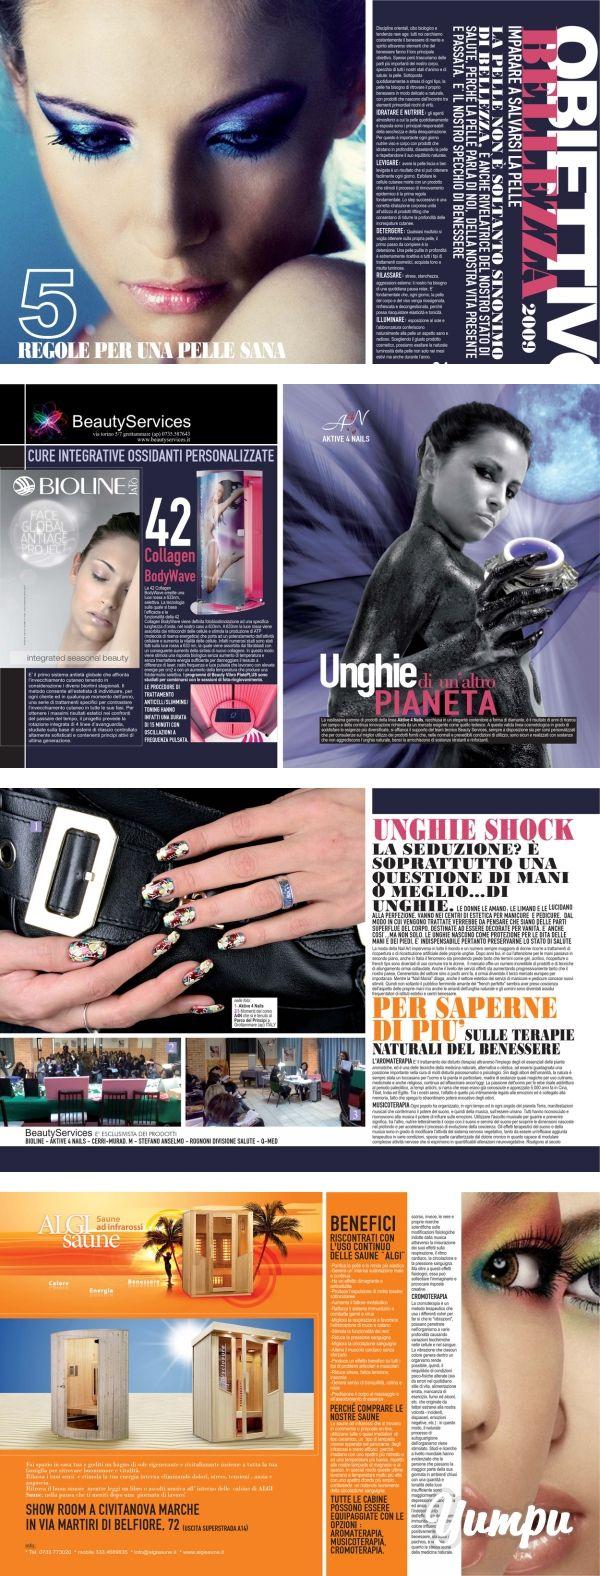 Mixer - Donna Impresa Magazine - Magazine with 4 pages: Mixer - Donna Impresa Magazine